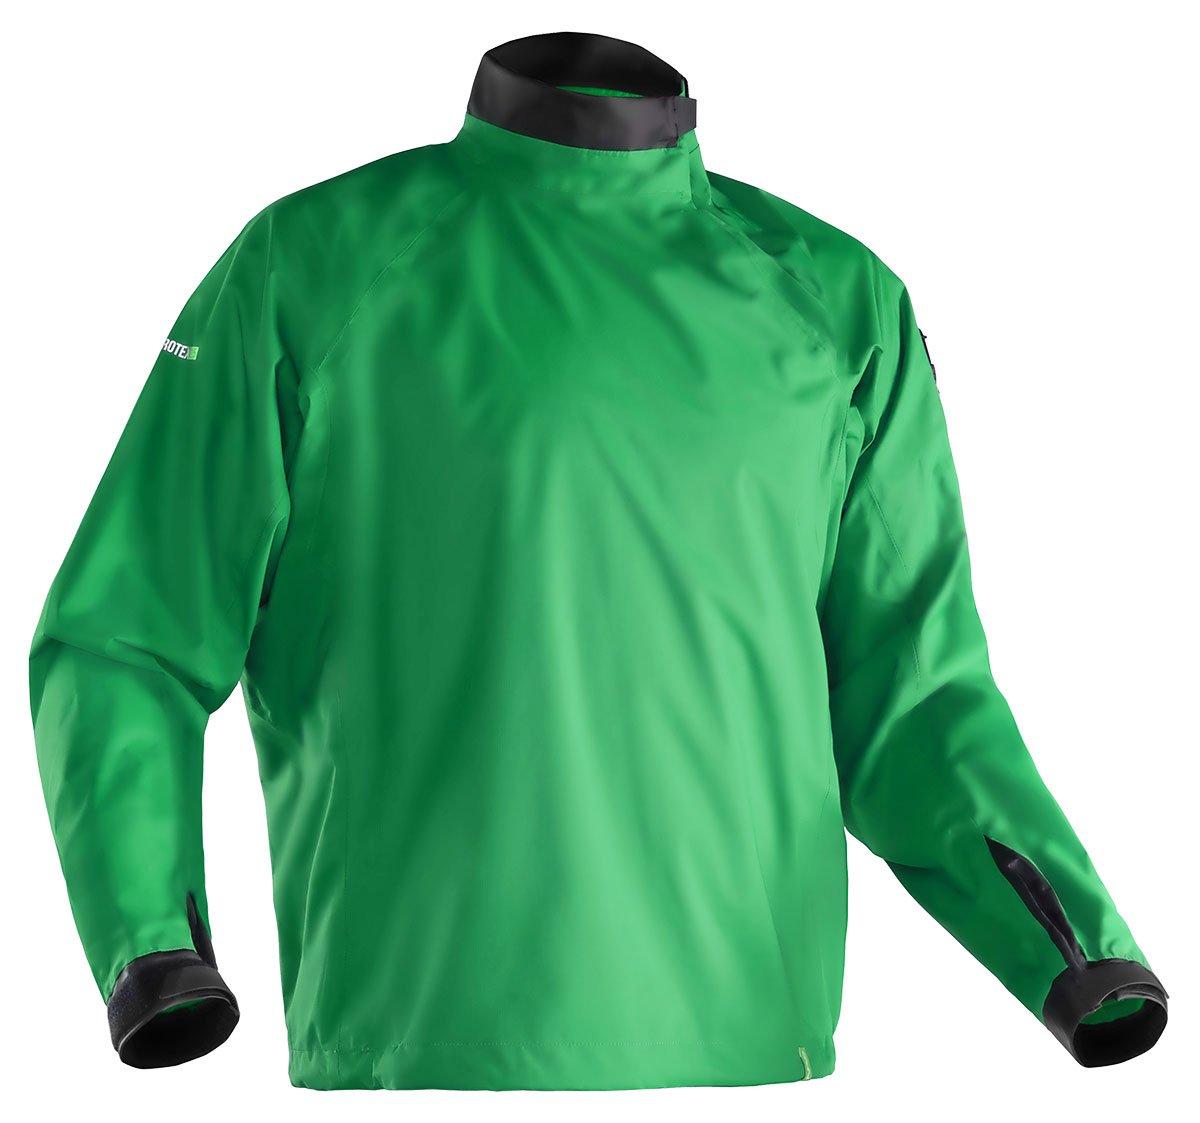 NRS Men's Endurance Paddling Jacket-Fern-S